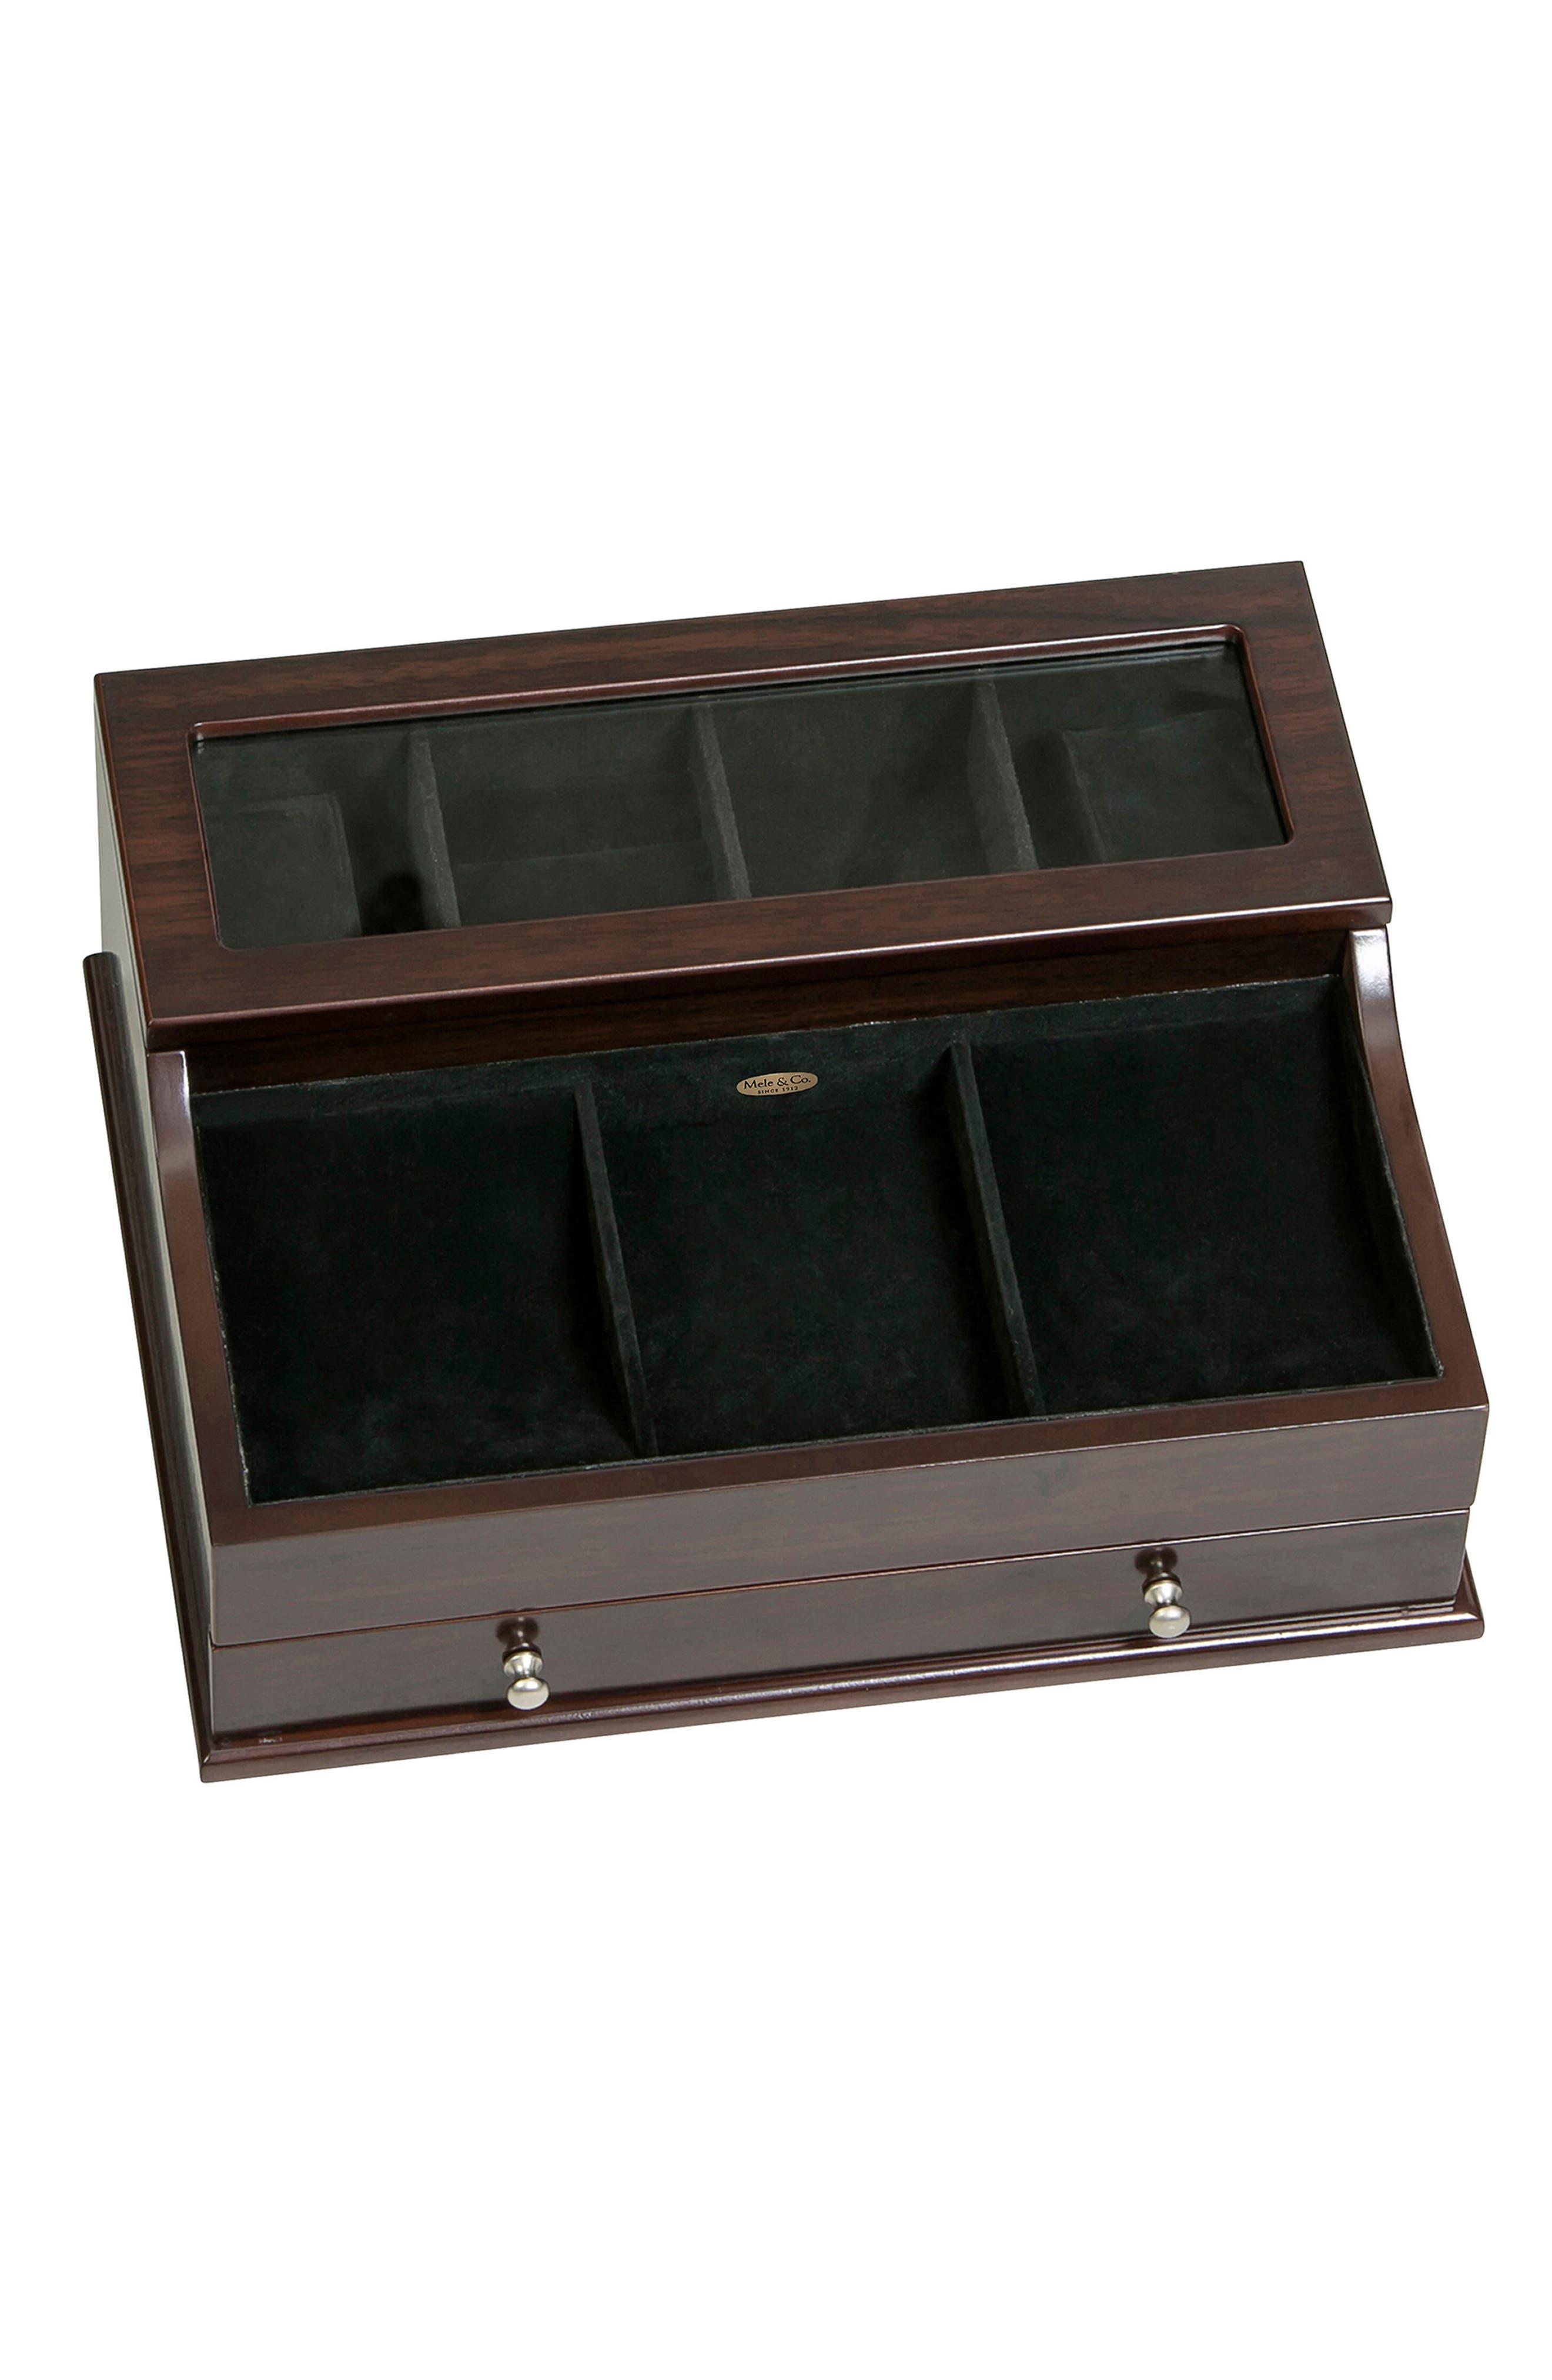 Main Image - Mele & Co. Hampden Glass Top Valet Box